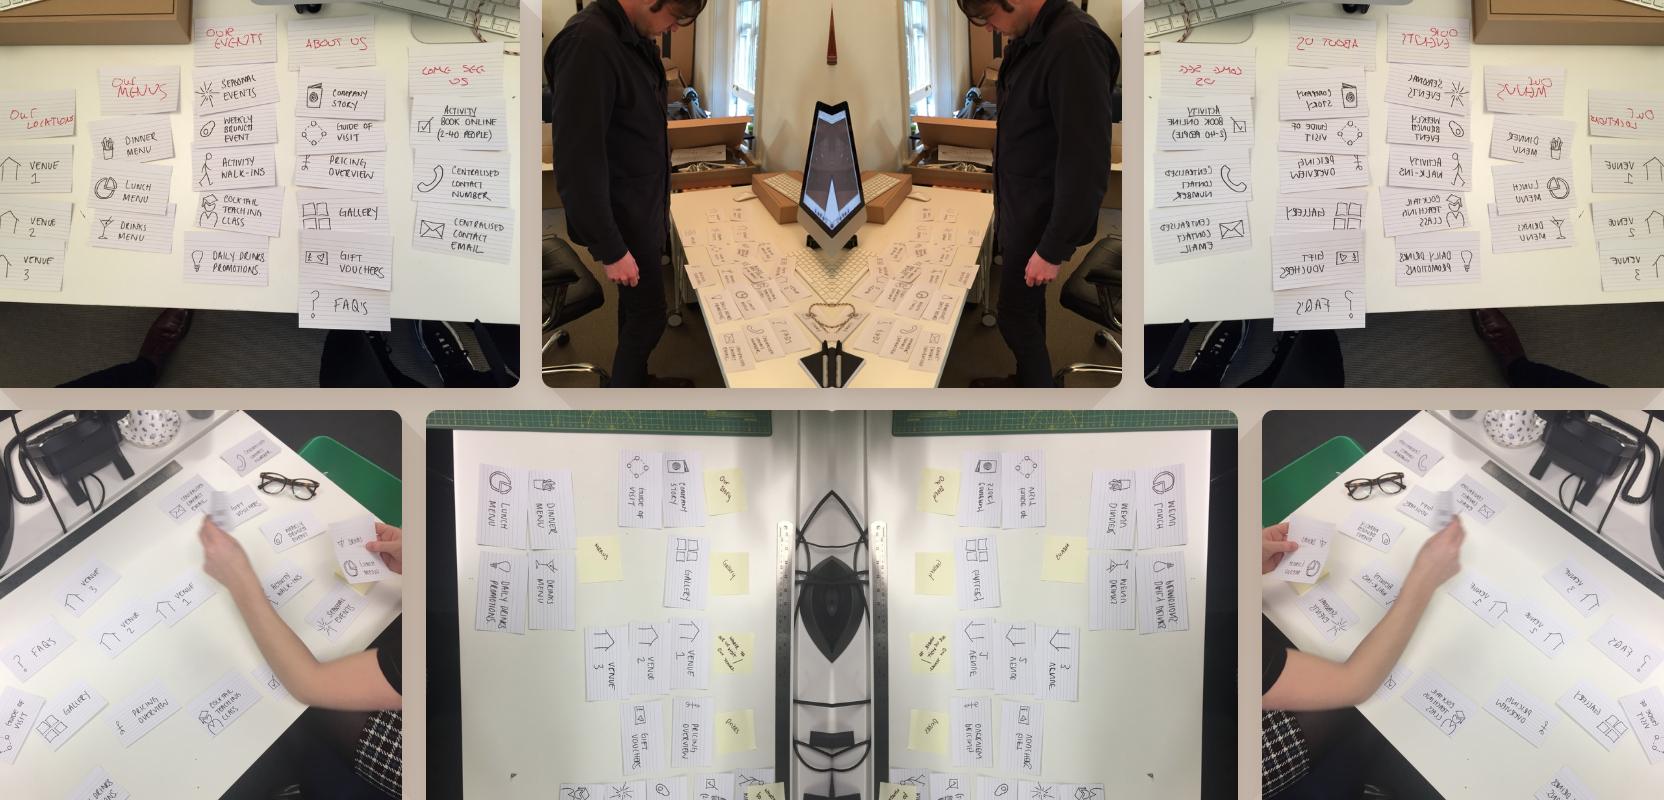 laurengracedesign-freelance-ux-designer-consultant-flight-club-darts-taxonomy-card-sorting.png